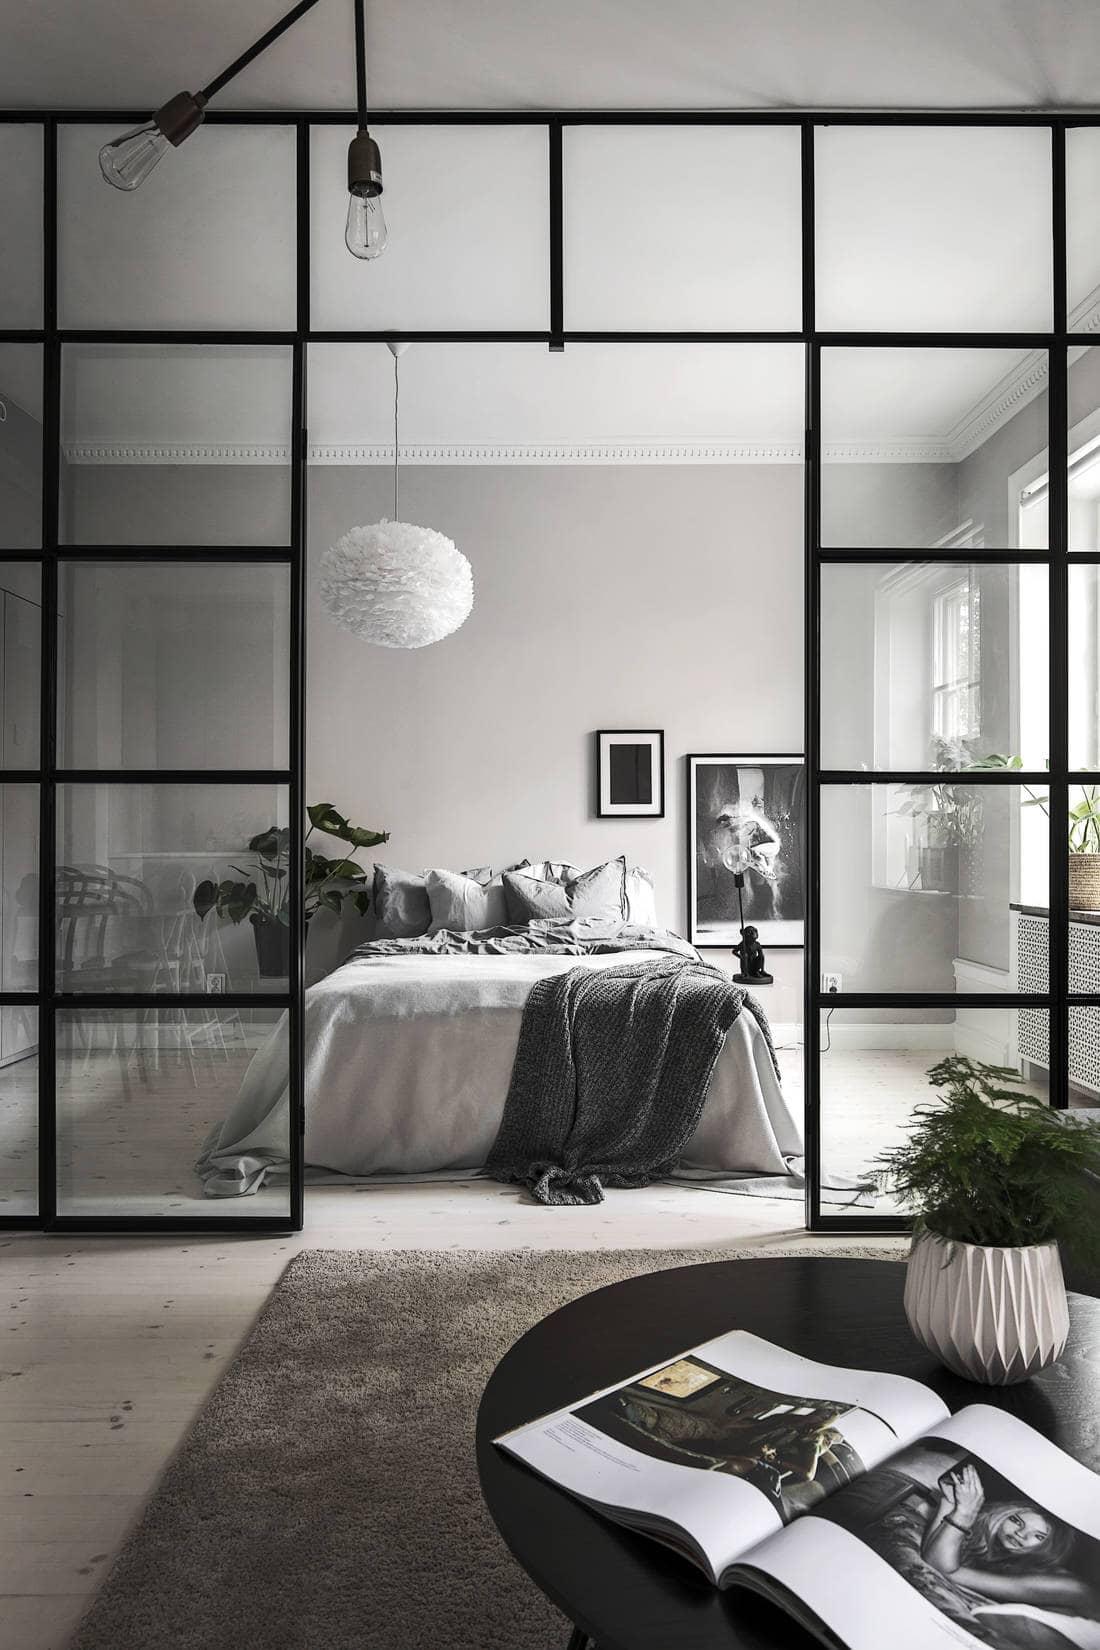 Kitchen living room and bedroom in one coco lapine designcoco lapine design